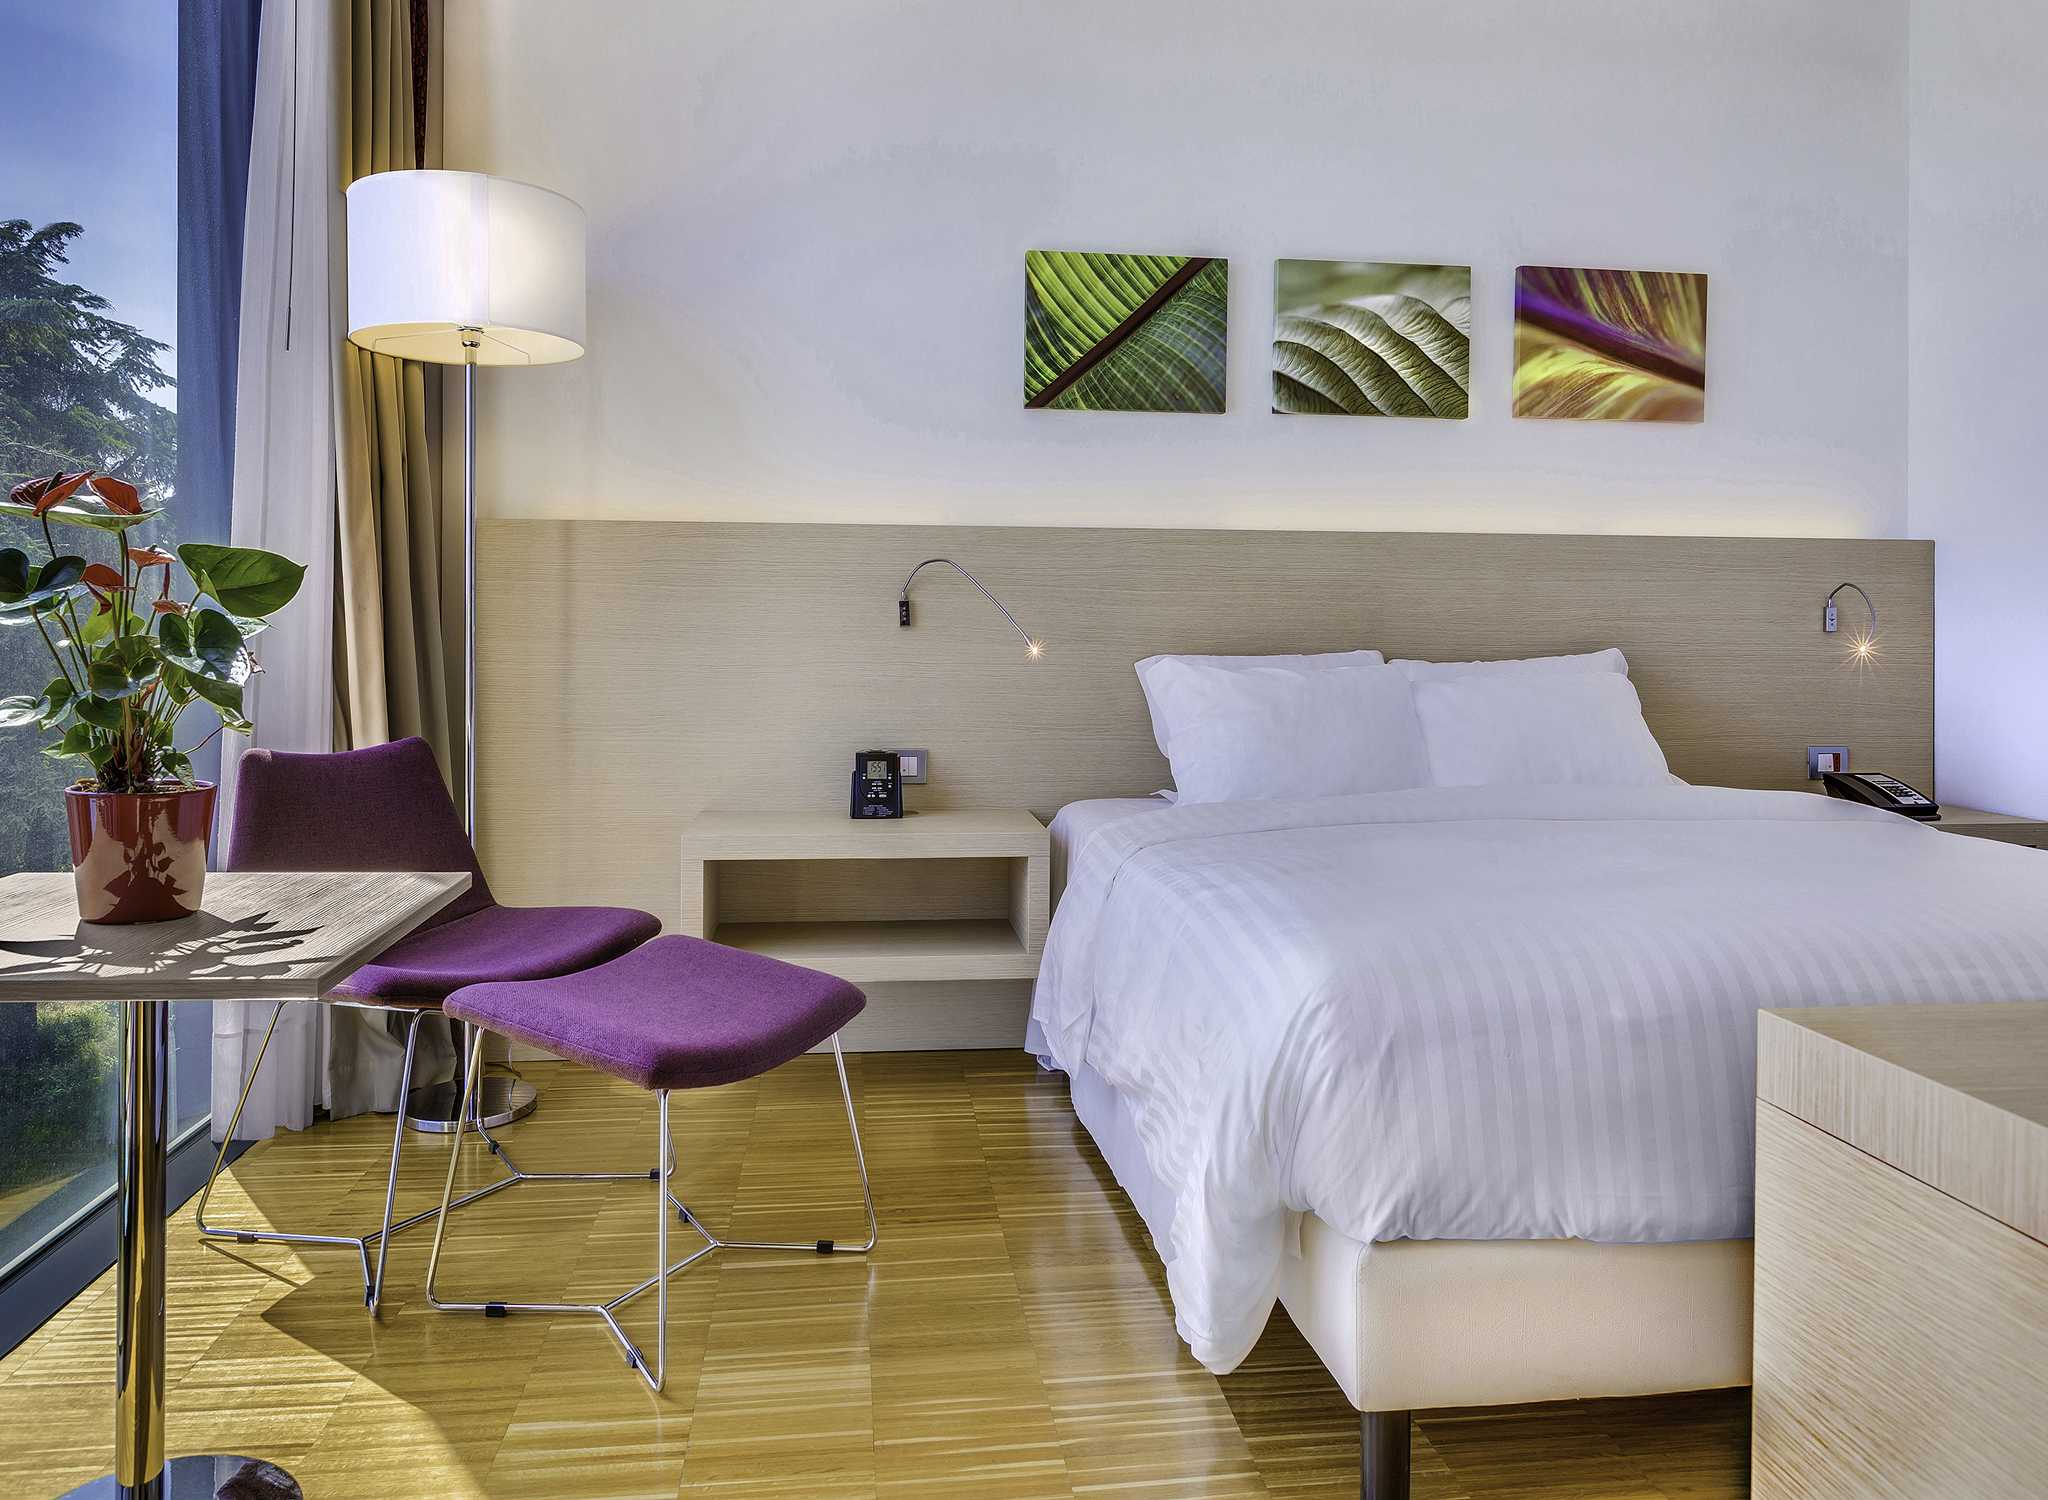 Hotel a Venezia Mestre